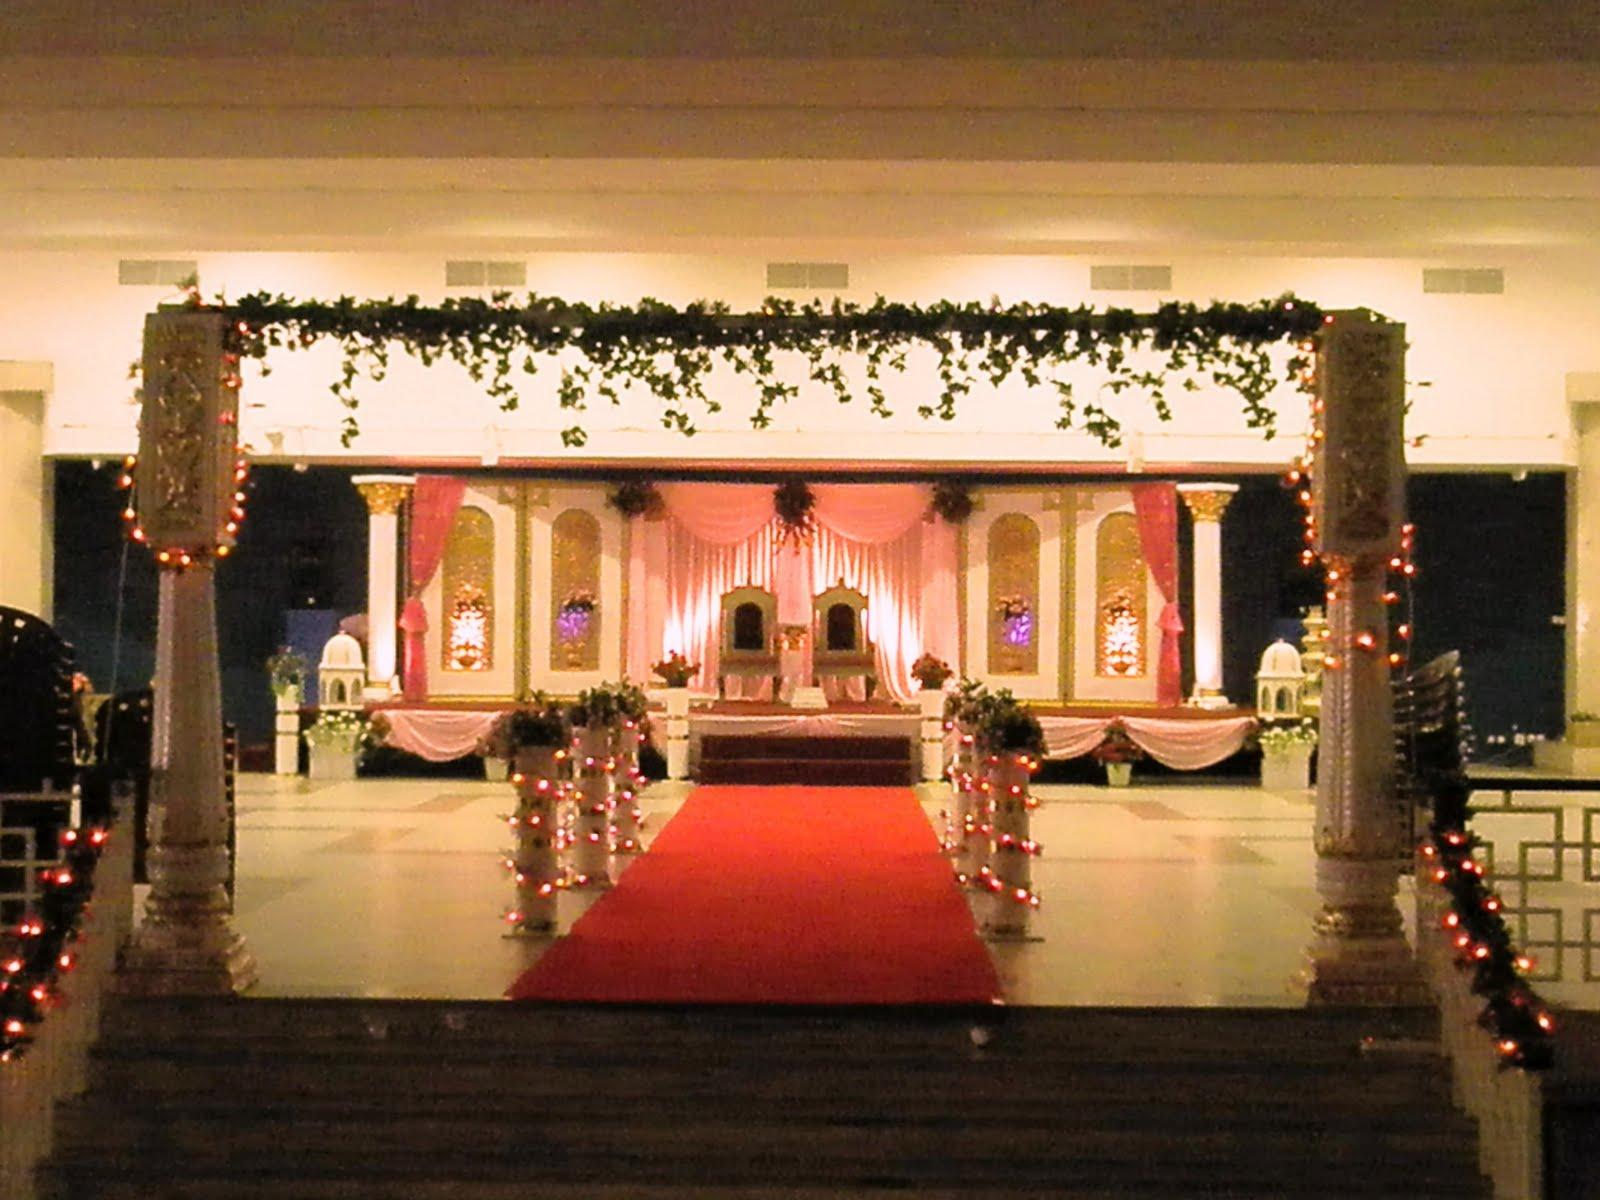 Traditional wedding decoration mandap decoration july 11 2009 junglespirit Image collections